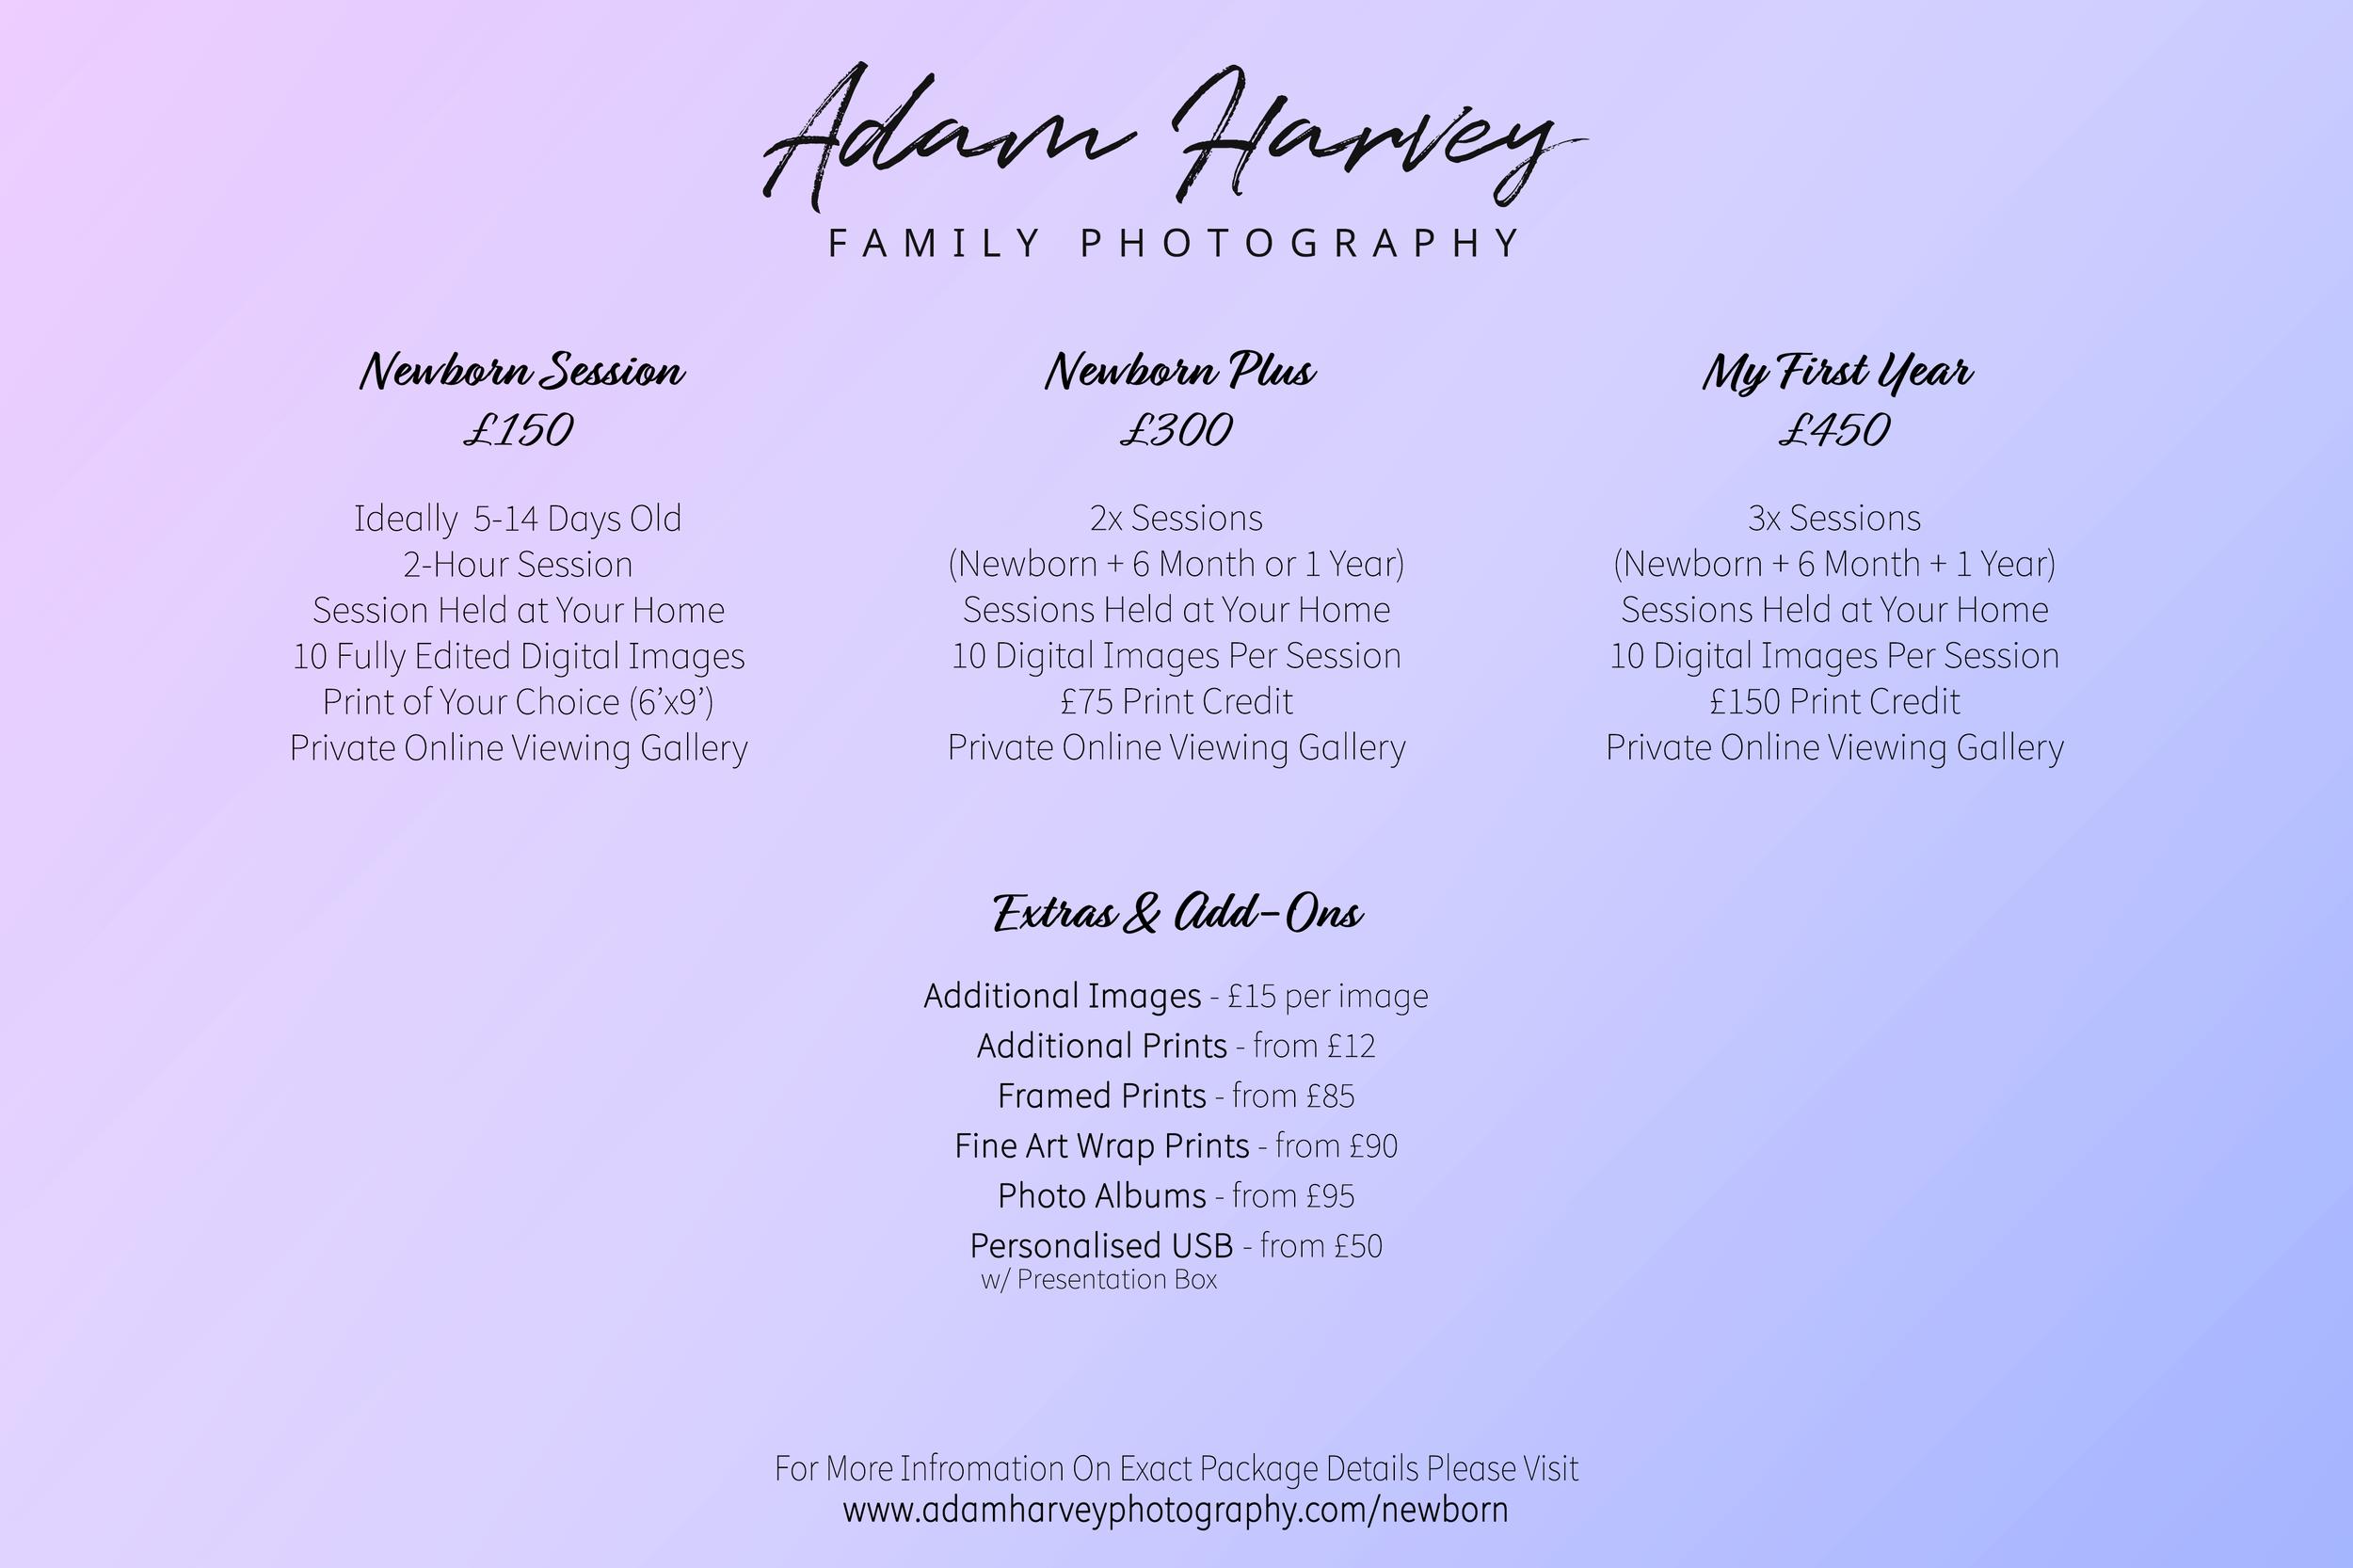 AHP-NEWBORN-Pricing.png